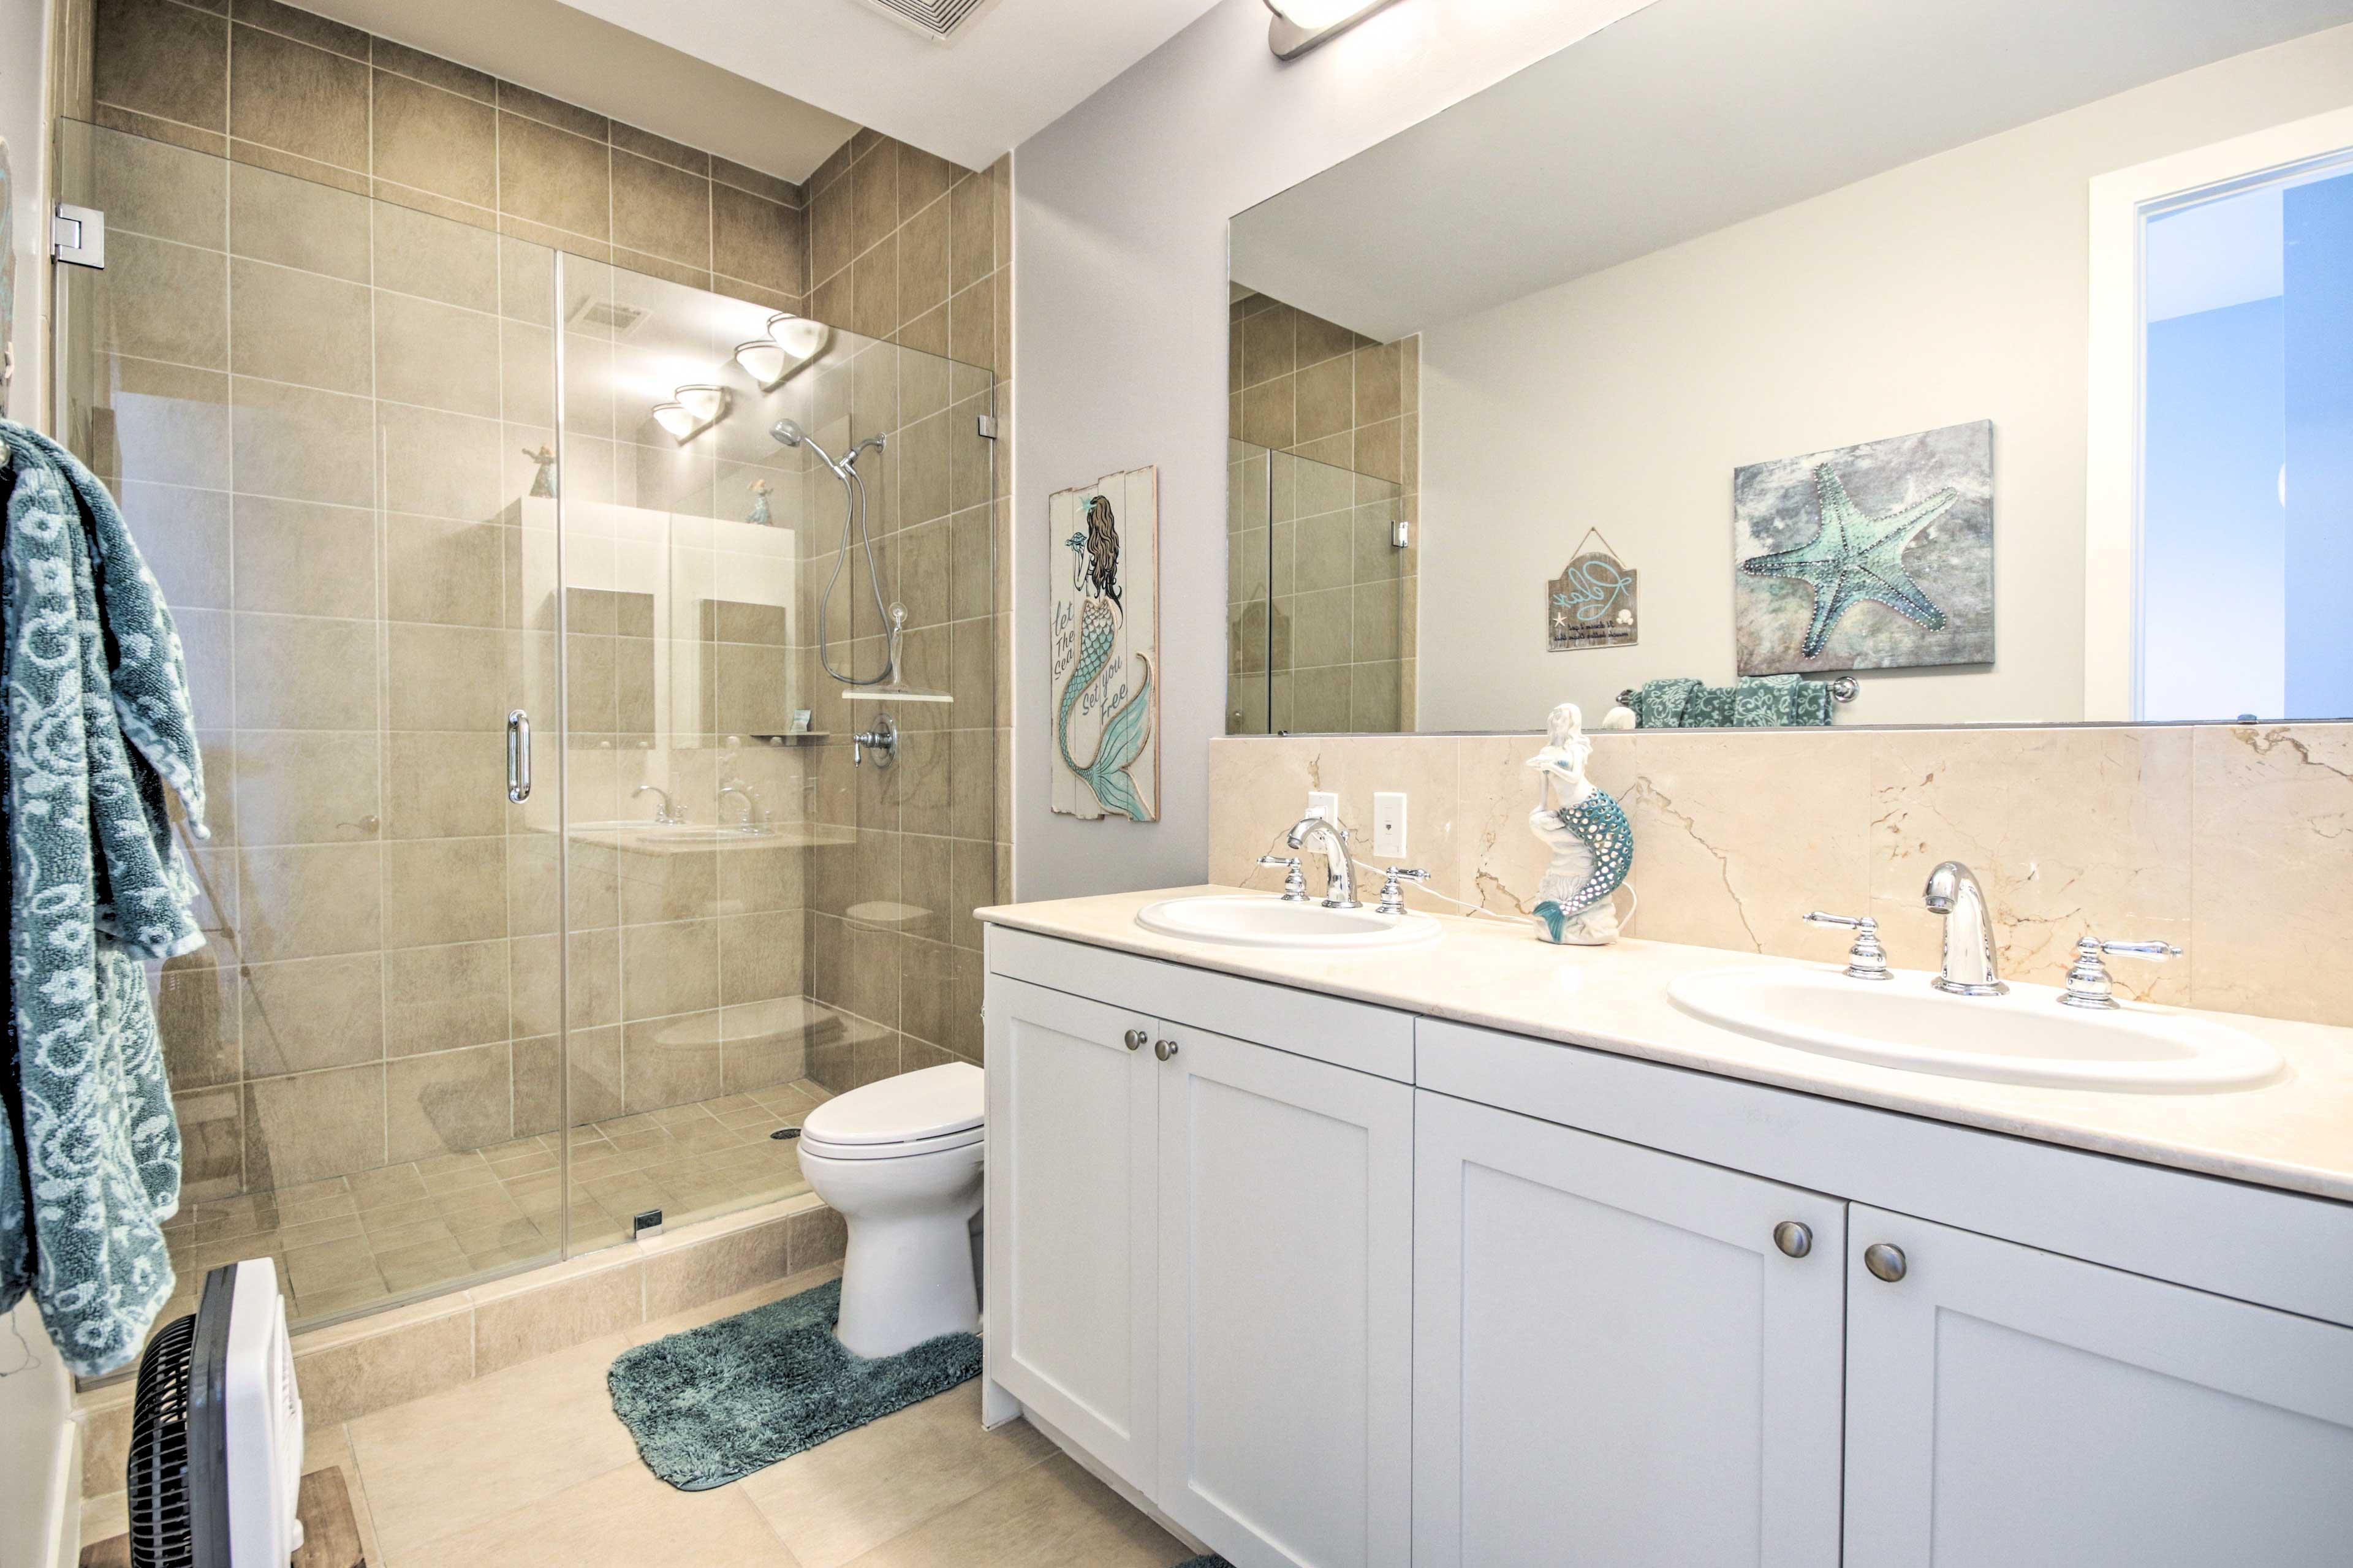 The en-suite bathroom has dual sinks and tile-filled shower.